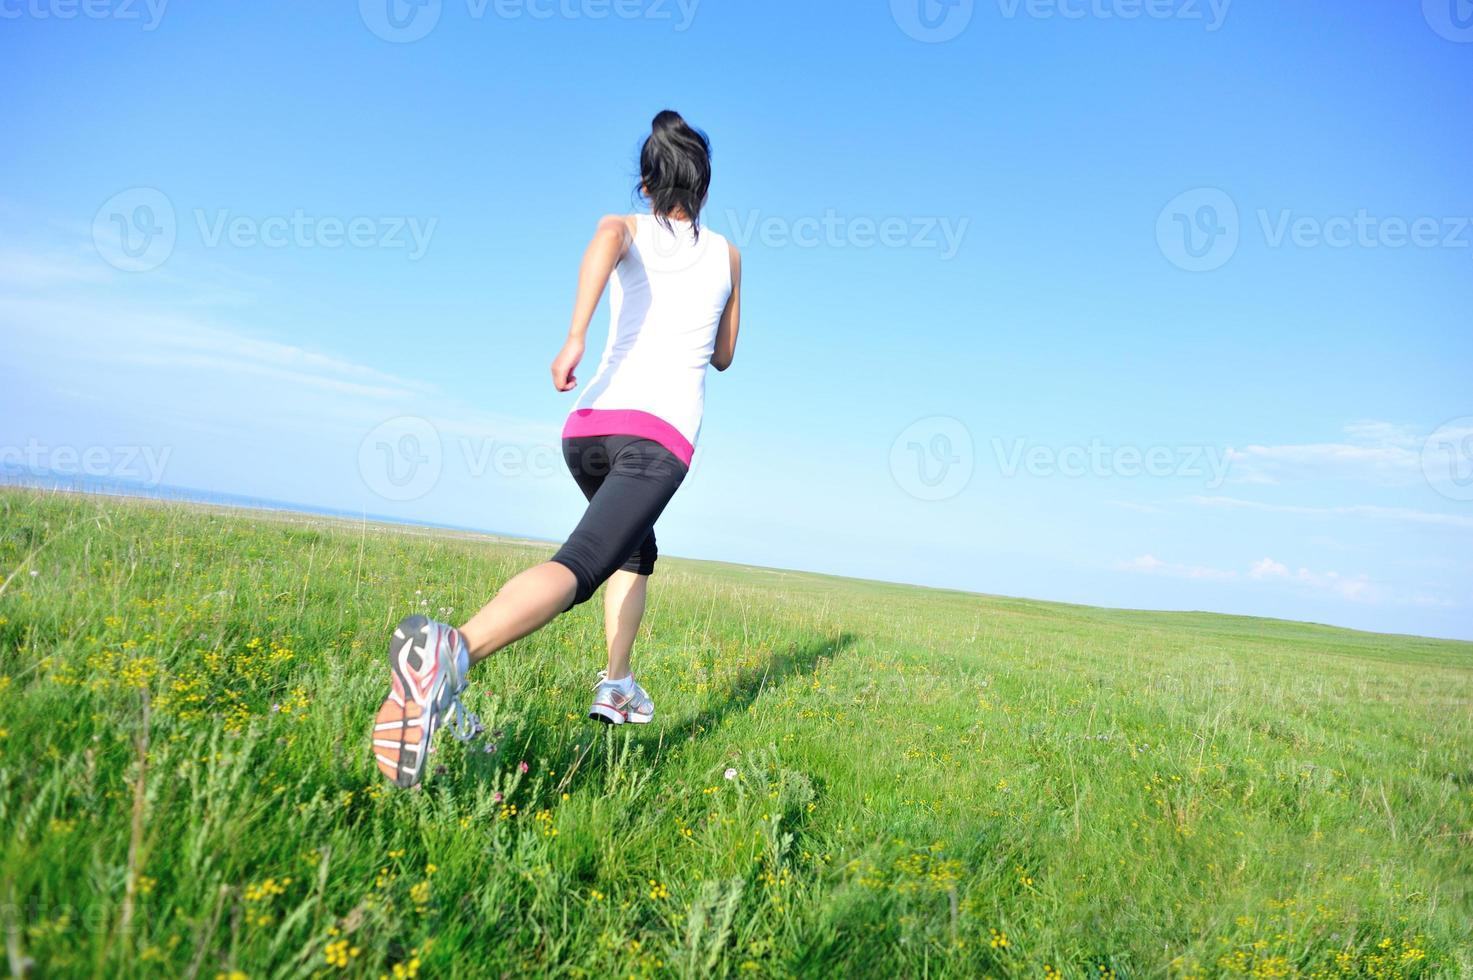 atleta corridore in esecuzione su prati foto